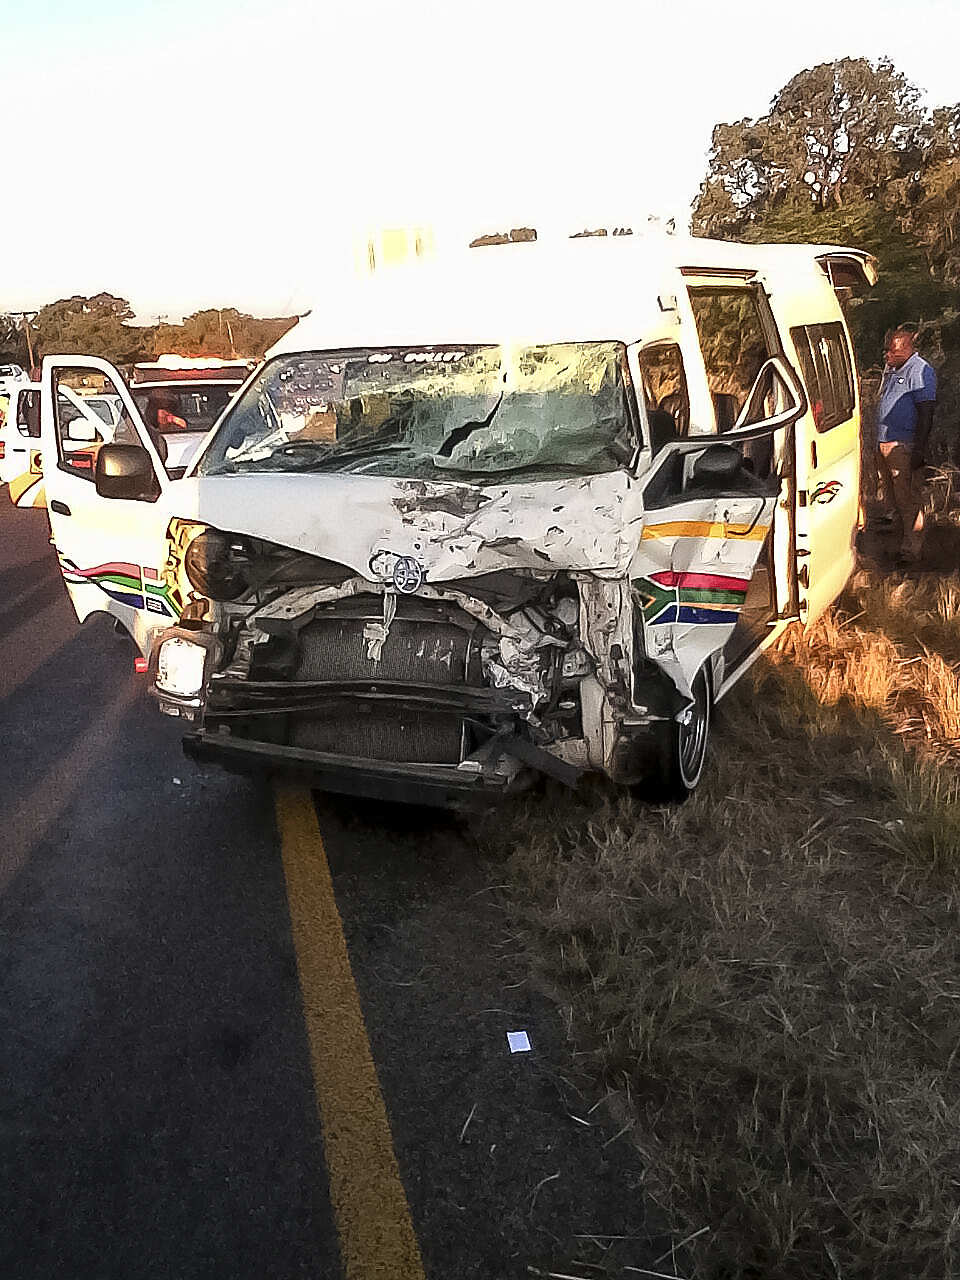 Kwa Mhlanga R573 crash leaves 10 injured